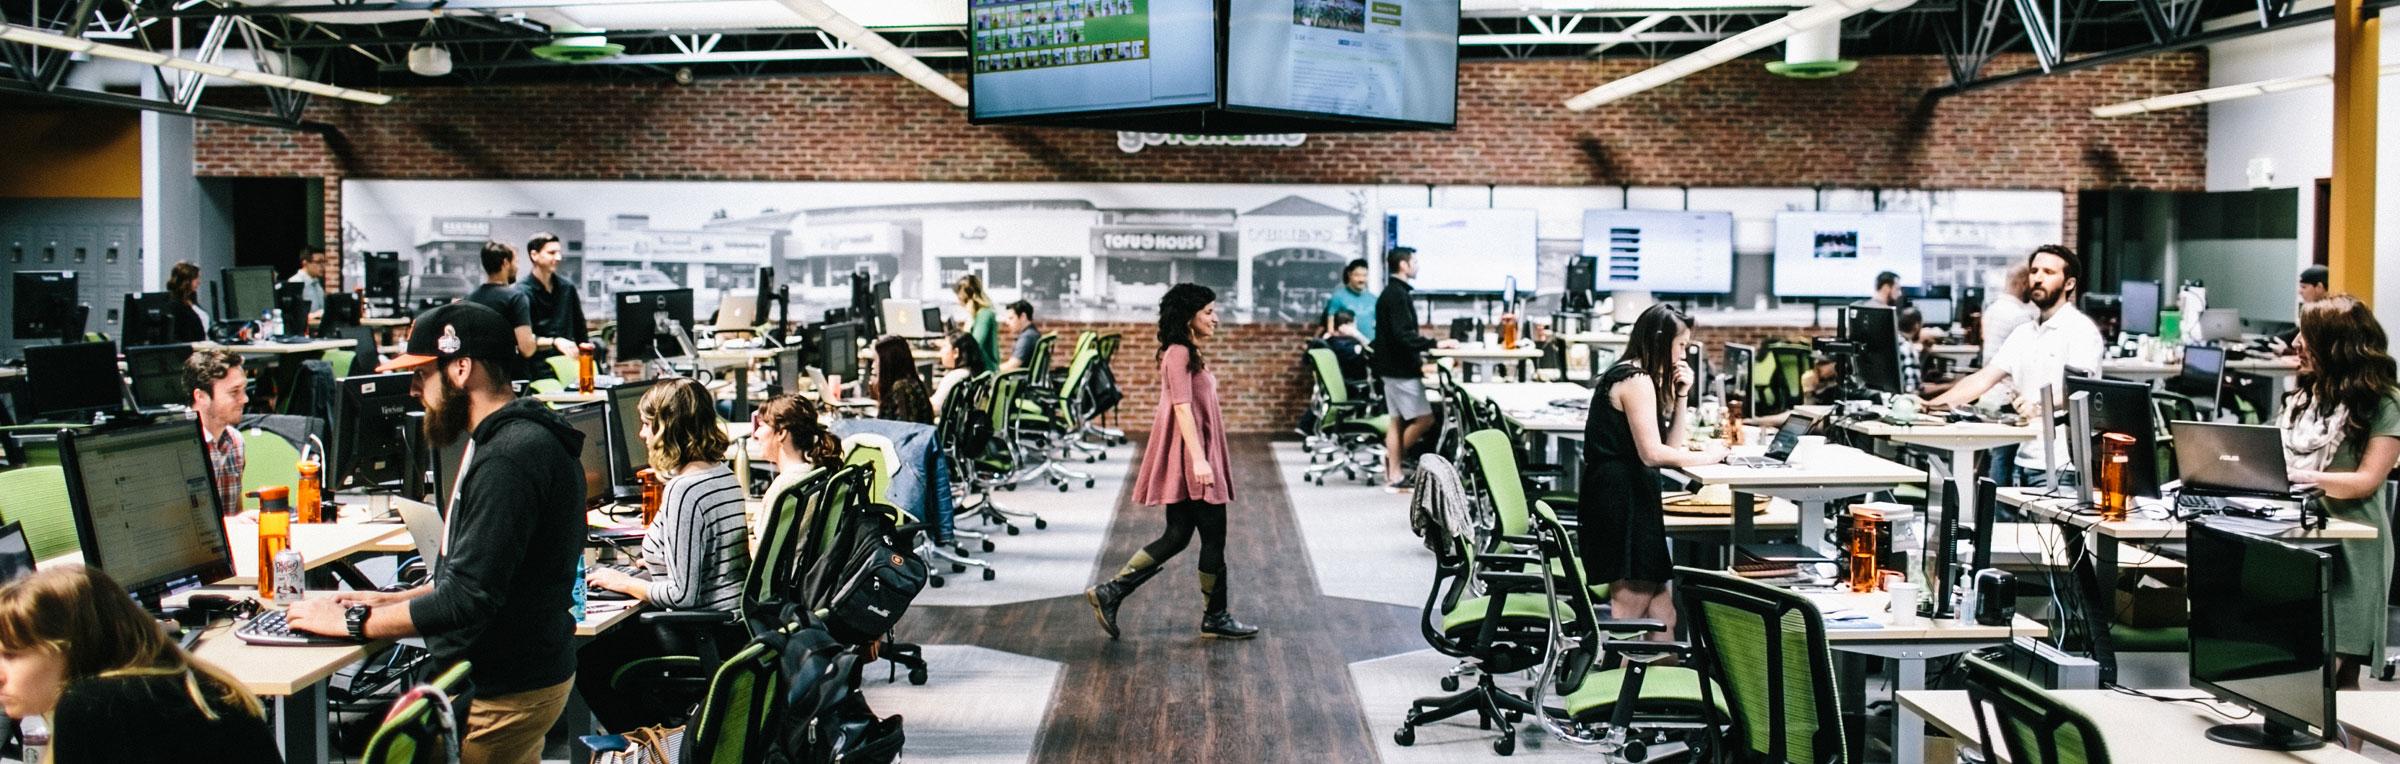 GoFundMe office